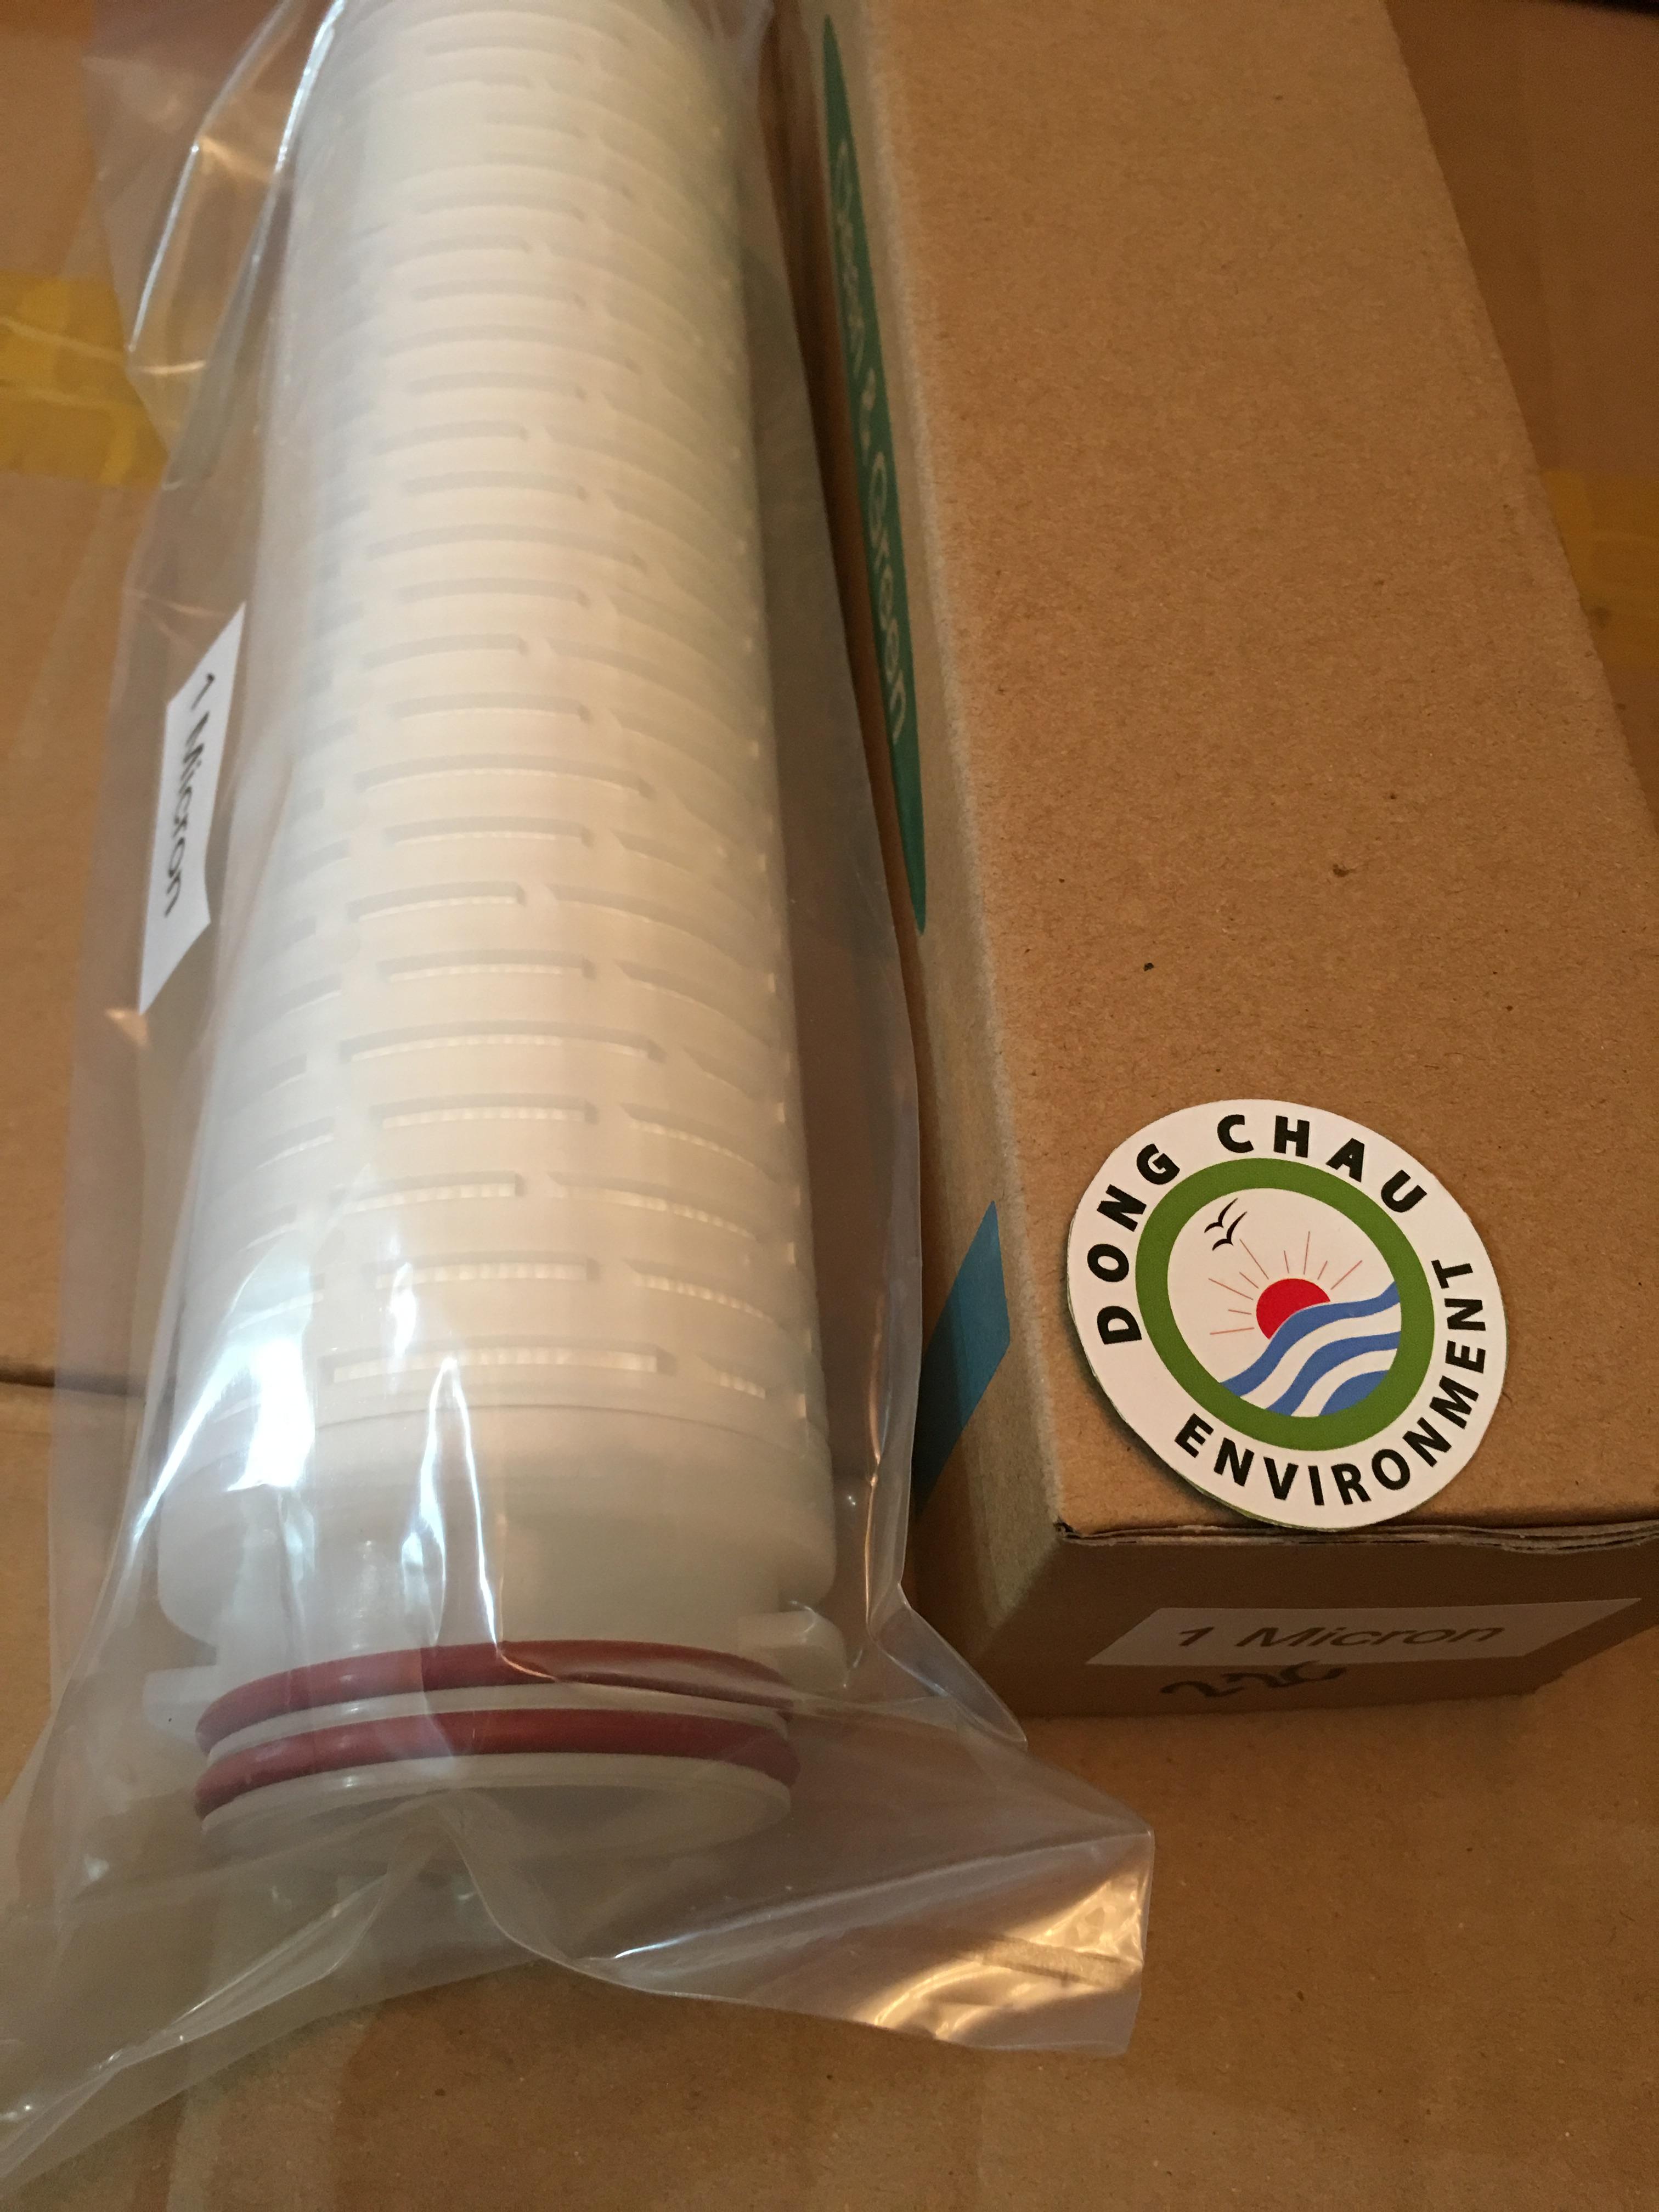 Lõi lọc giấy xếp 1 micron 10 inch Clean Green oring 226